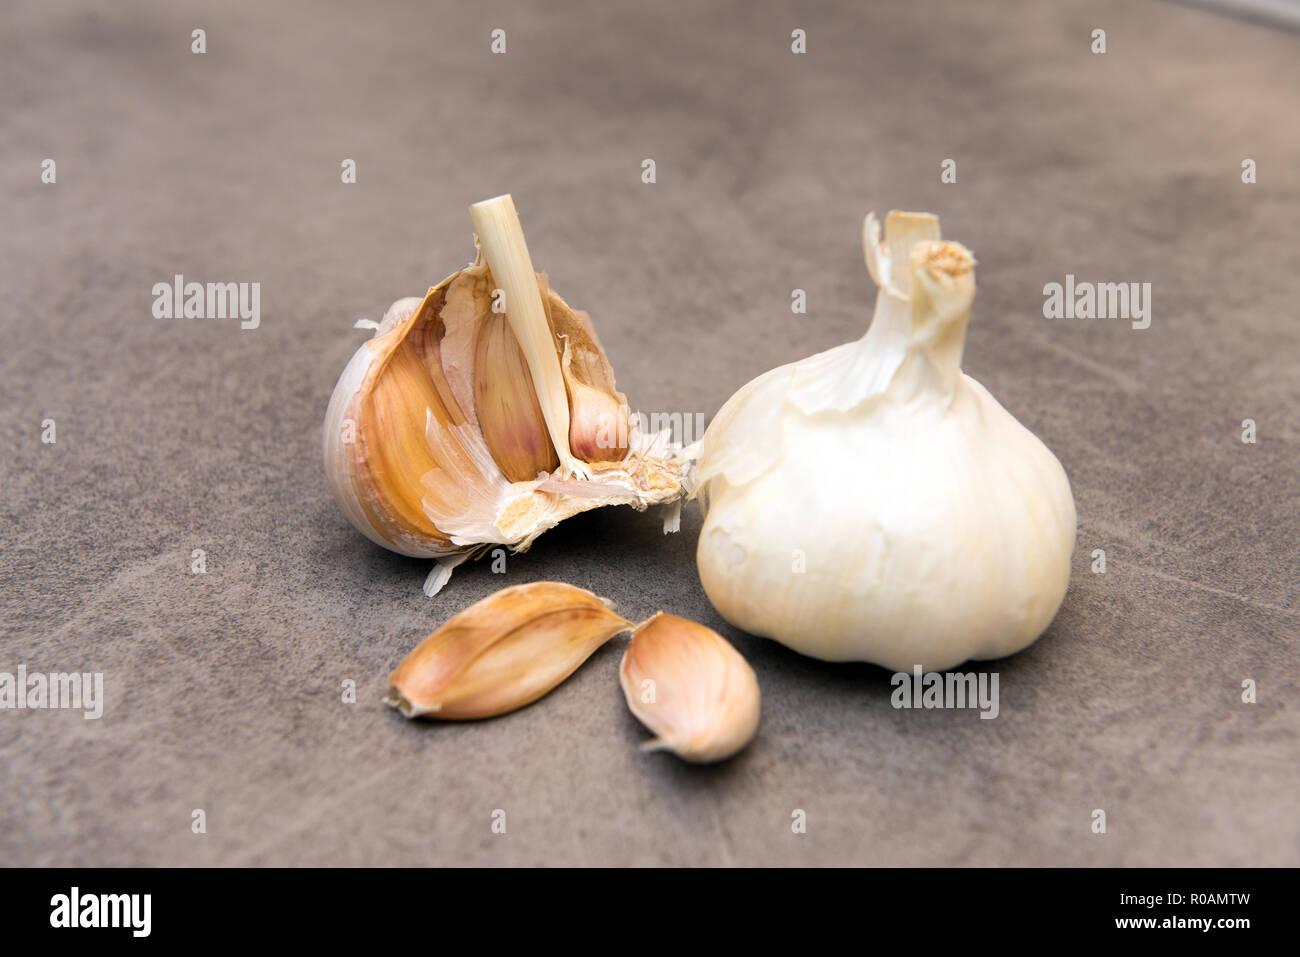 Garlic - a natural antibiotic Stock Photo: 223970681 - Alamy